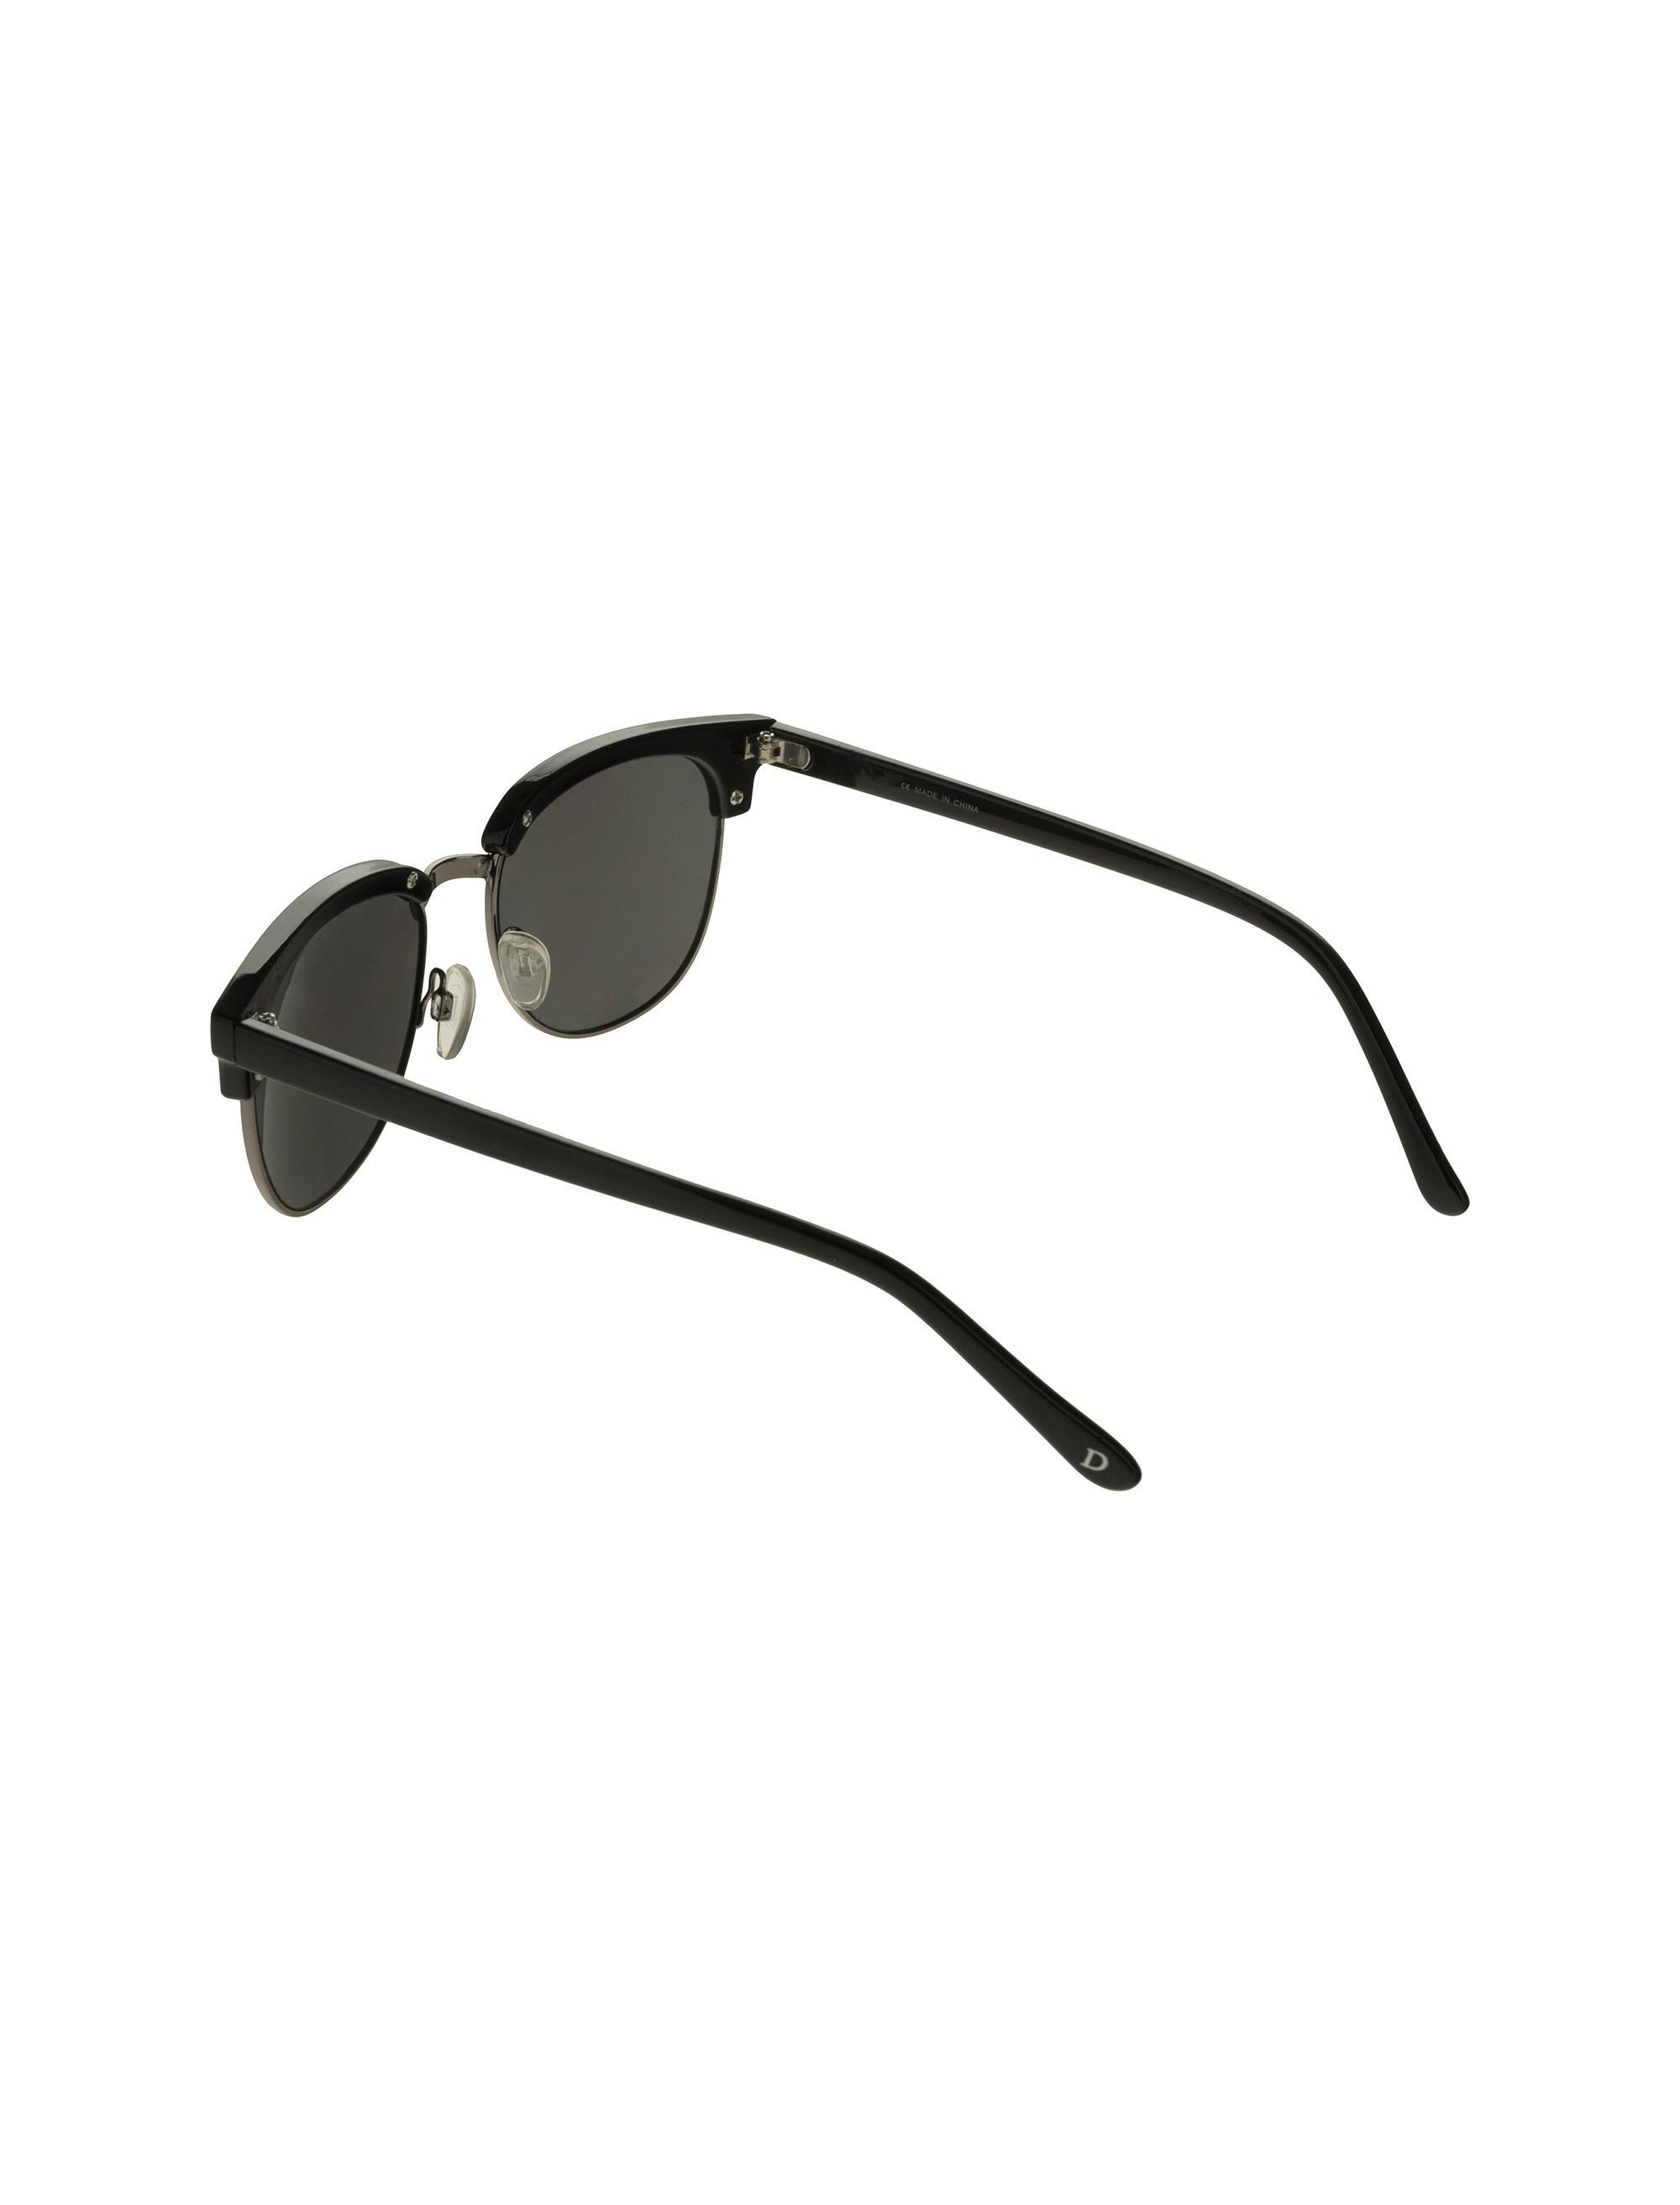 عینک آفتابی کلاب مستر مردانه - دون لندن - مشکي - 2